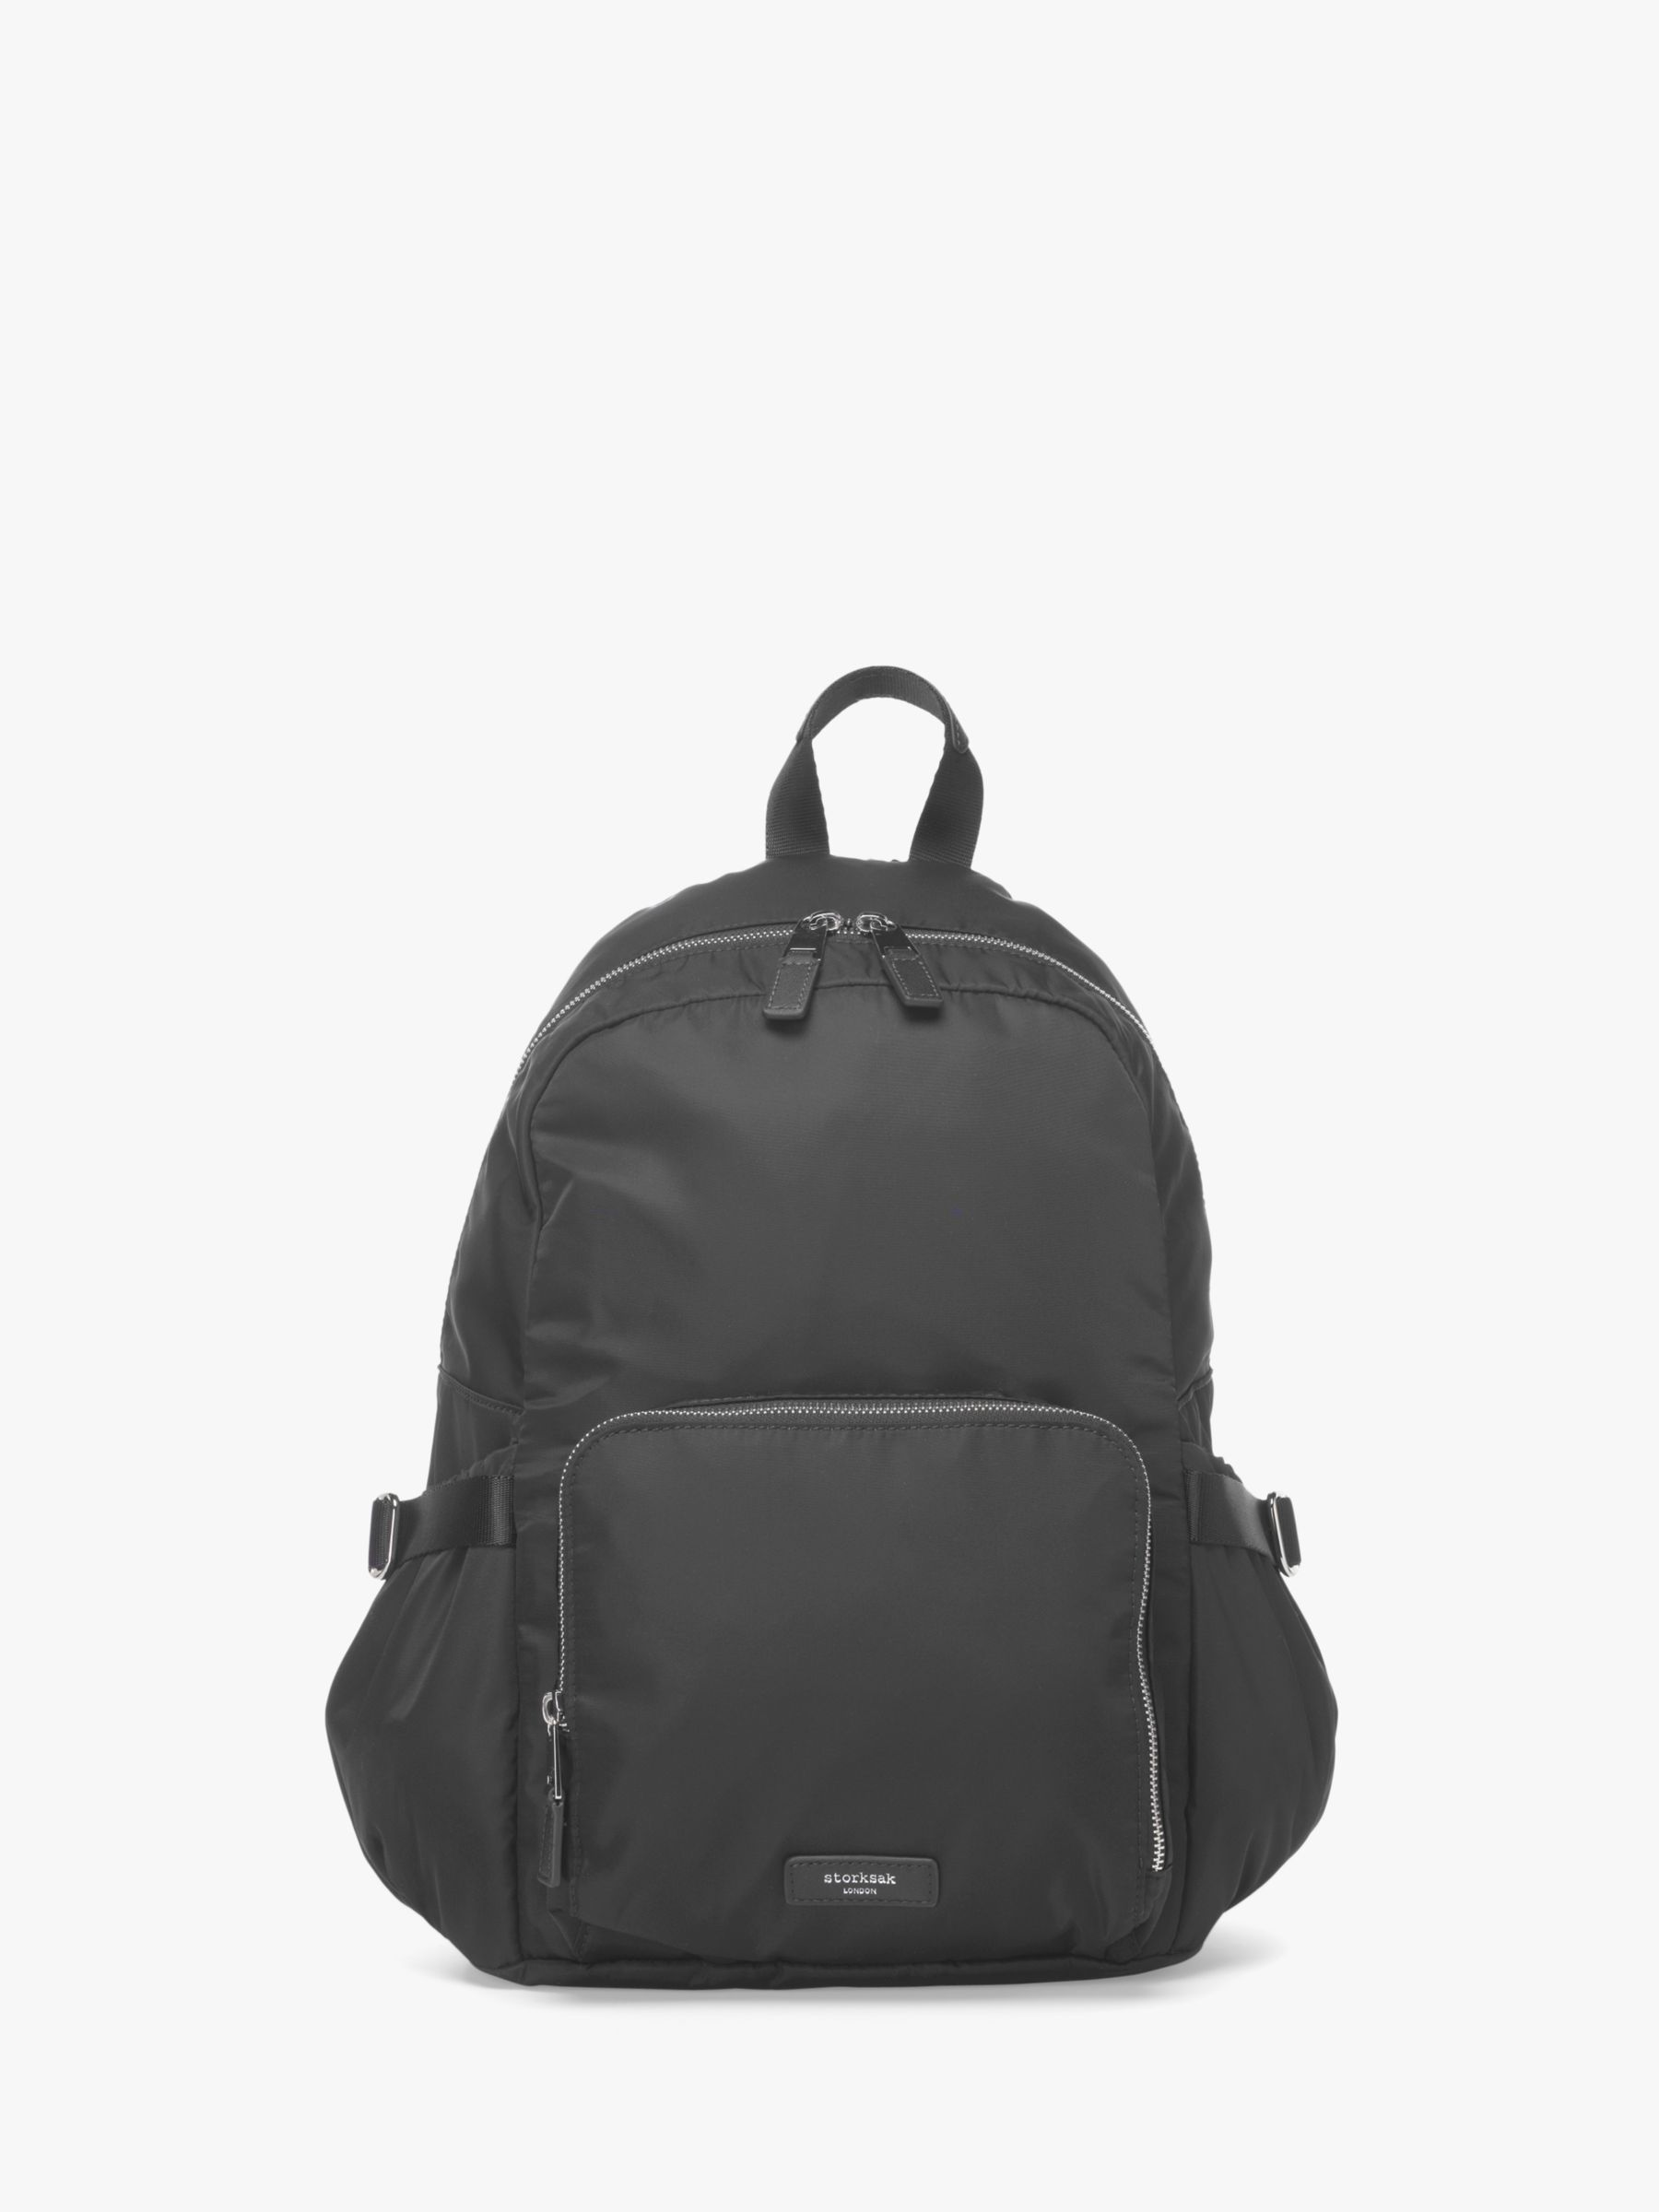 Storksak Storksak Hero Changing Backpack, Black